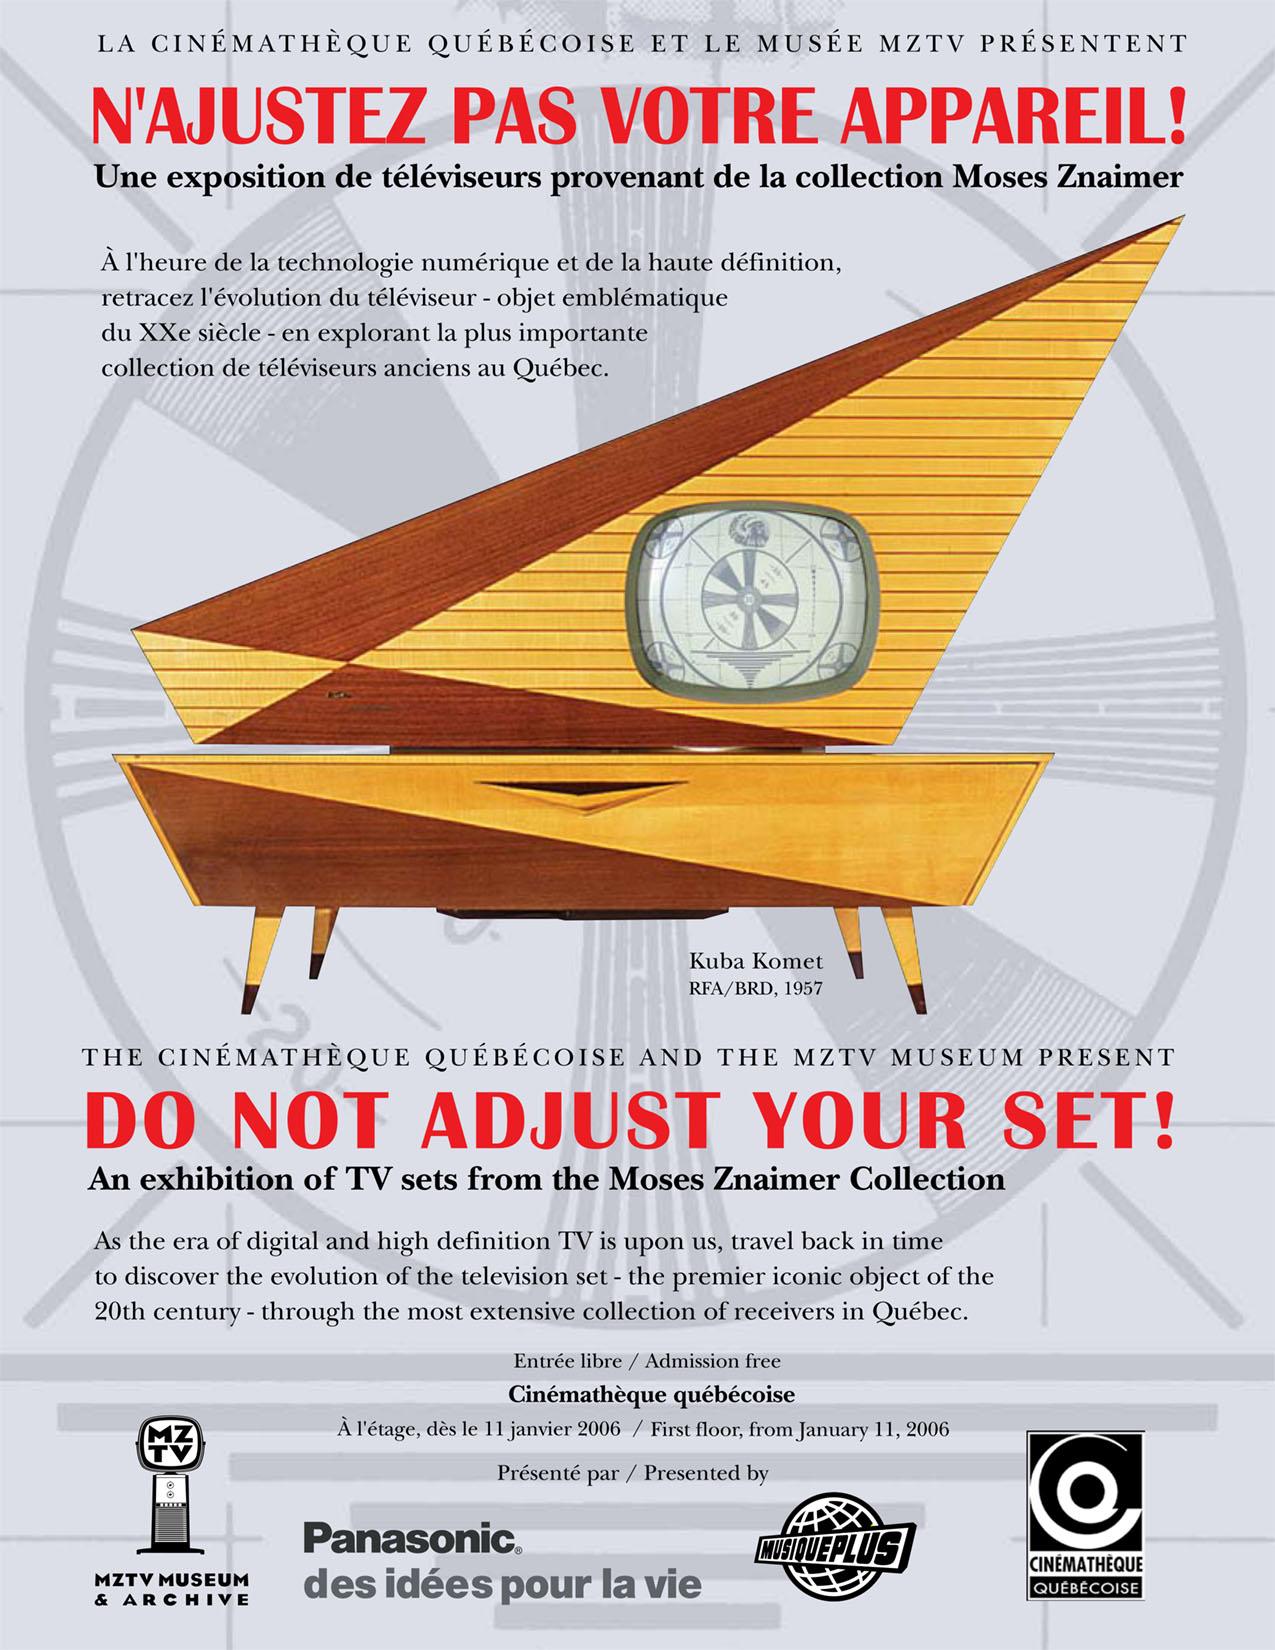 Do Not Adjust Your Set!